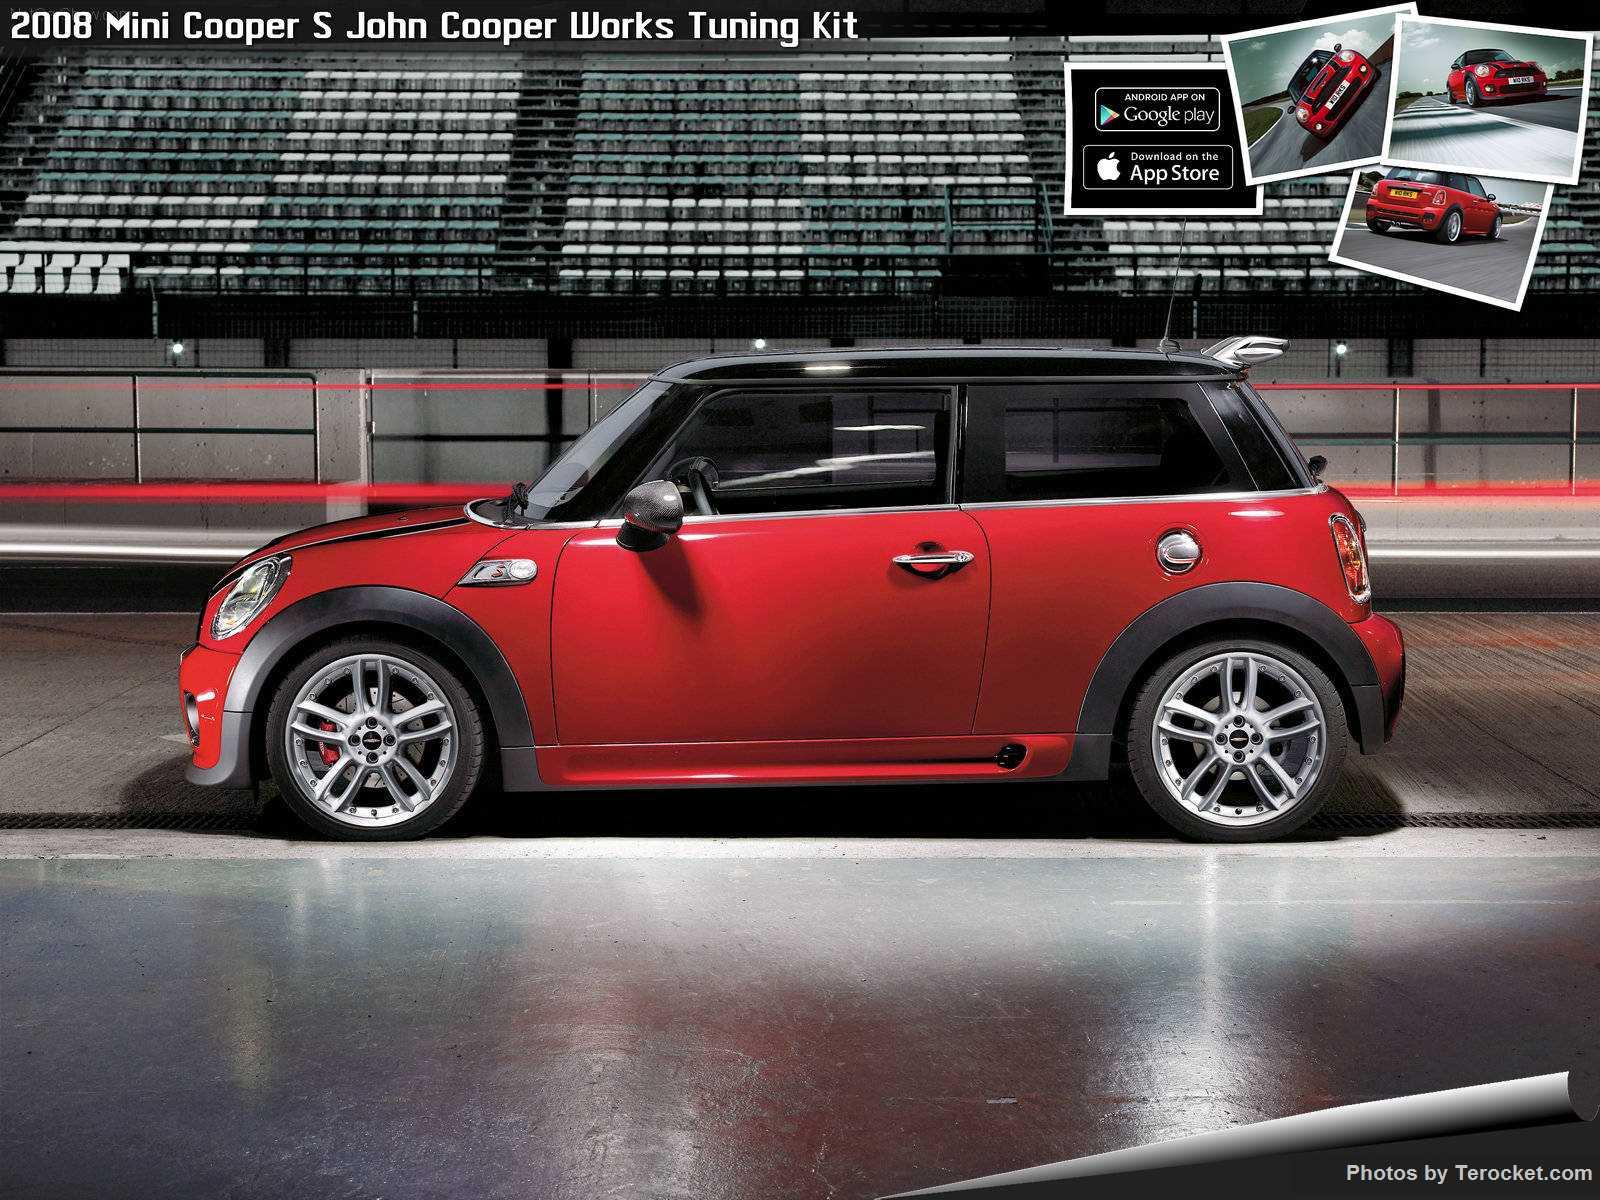 Hình ảnh xe ô tô Mini Cooper S John Cooper Works Tuning Kit 2008 & nội ngoại thất